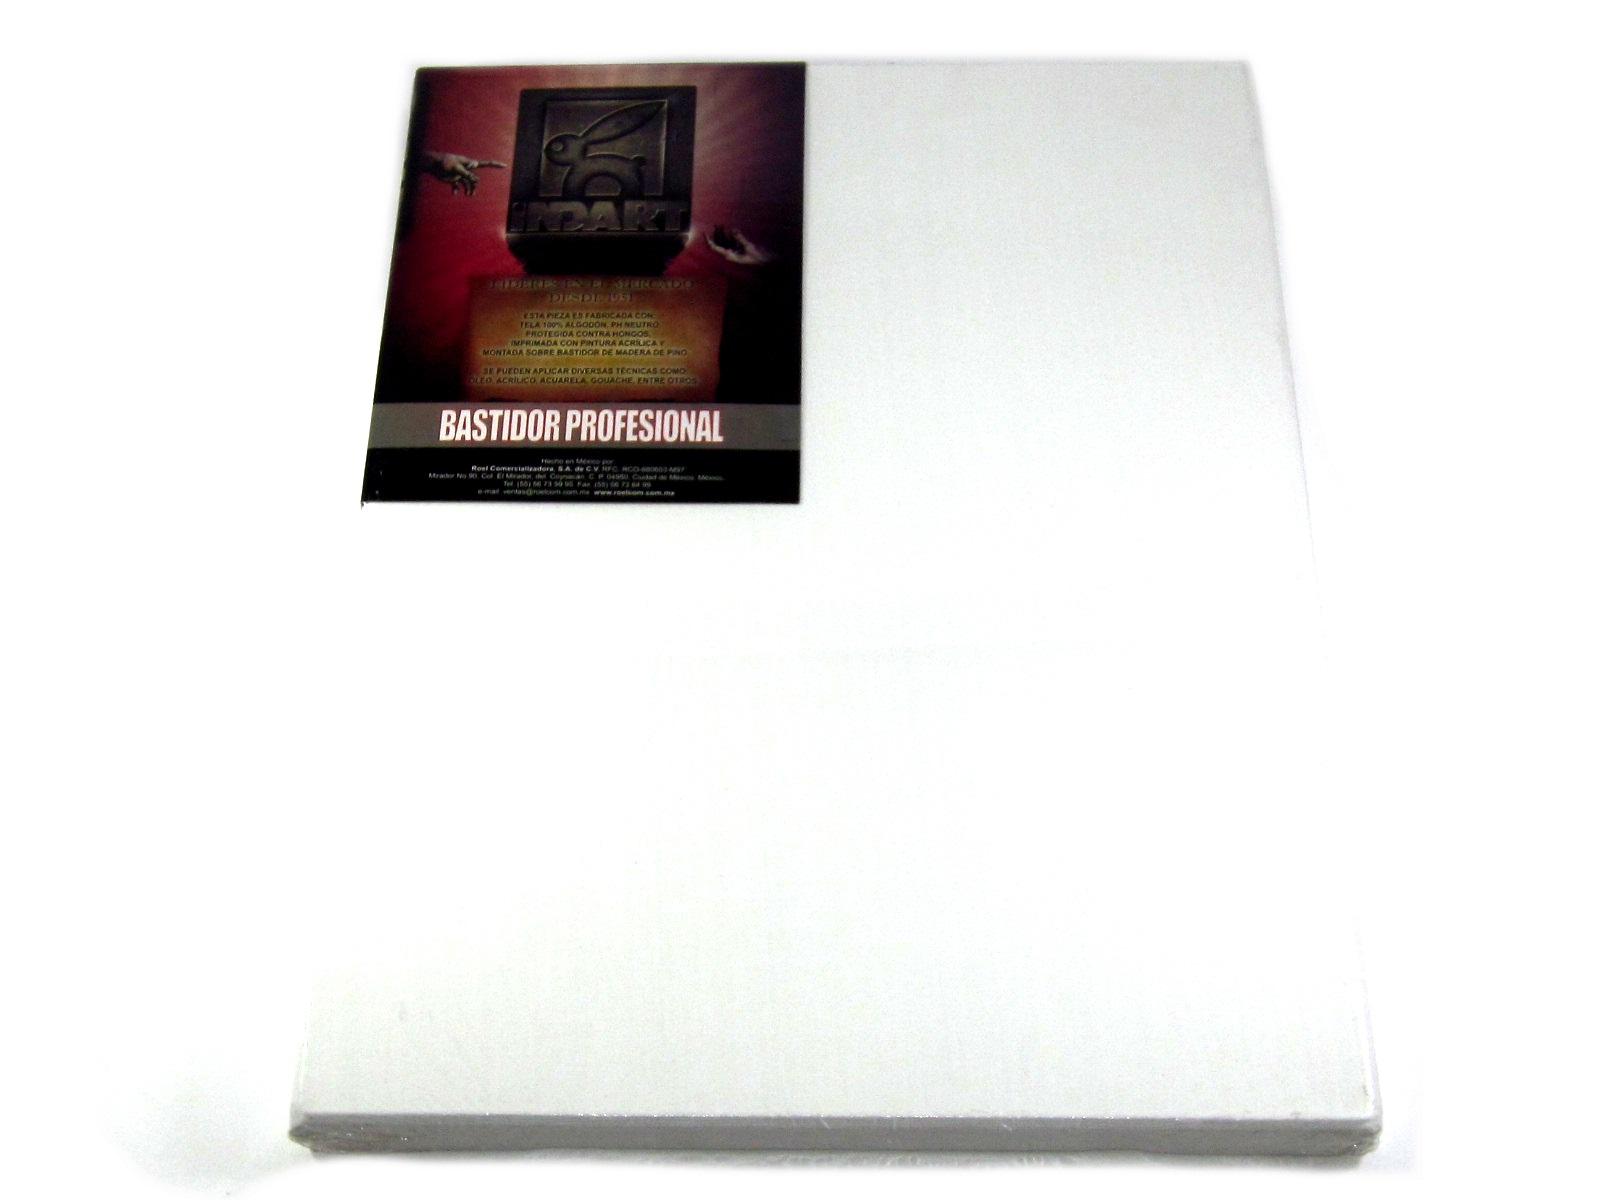 BASTIDOR TELA PROF 30 X 40 INDART - Proveedora de Oficinas